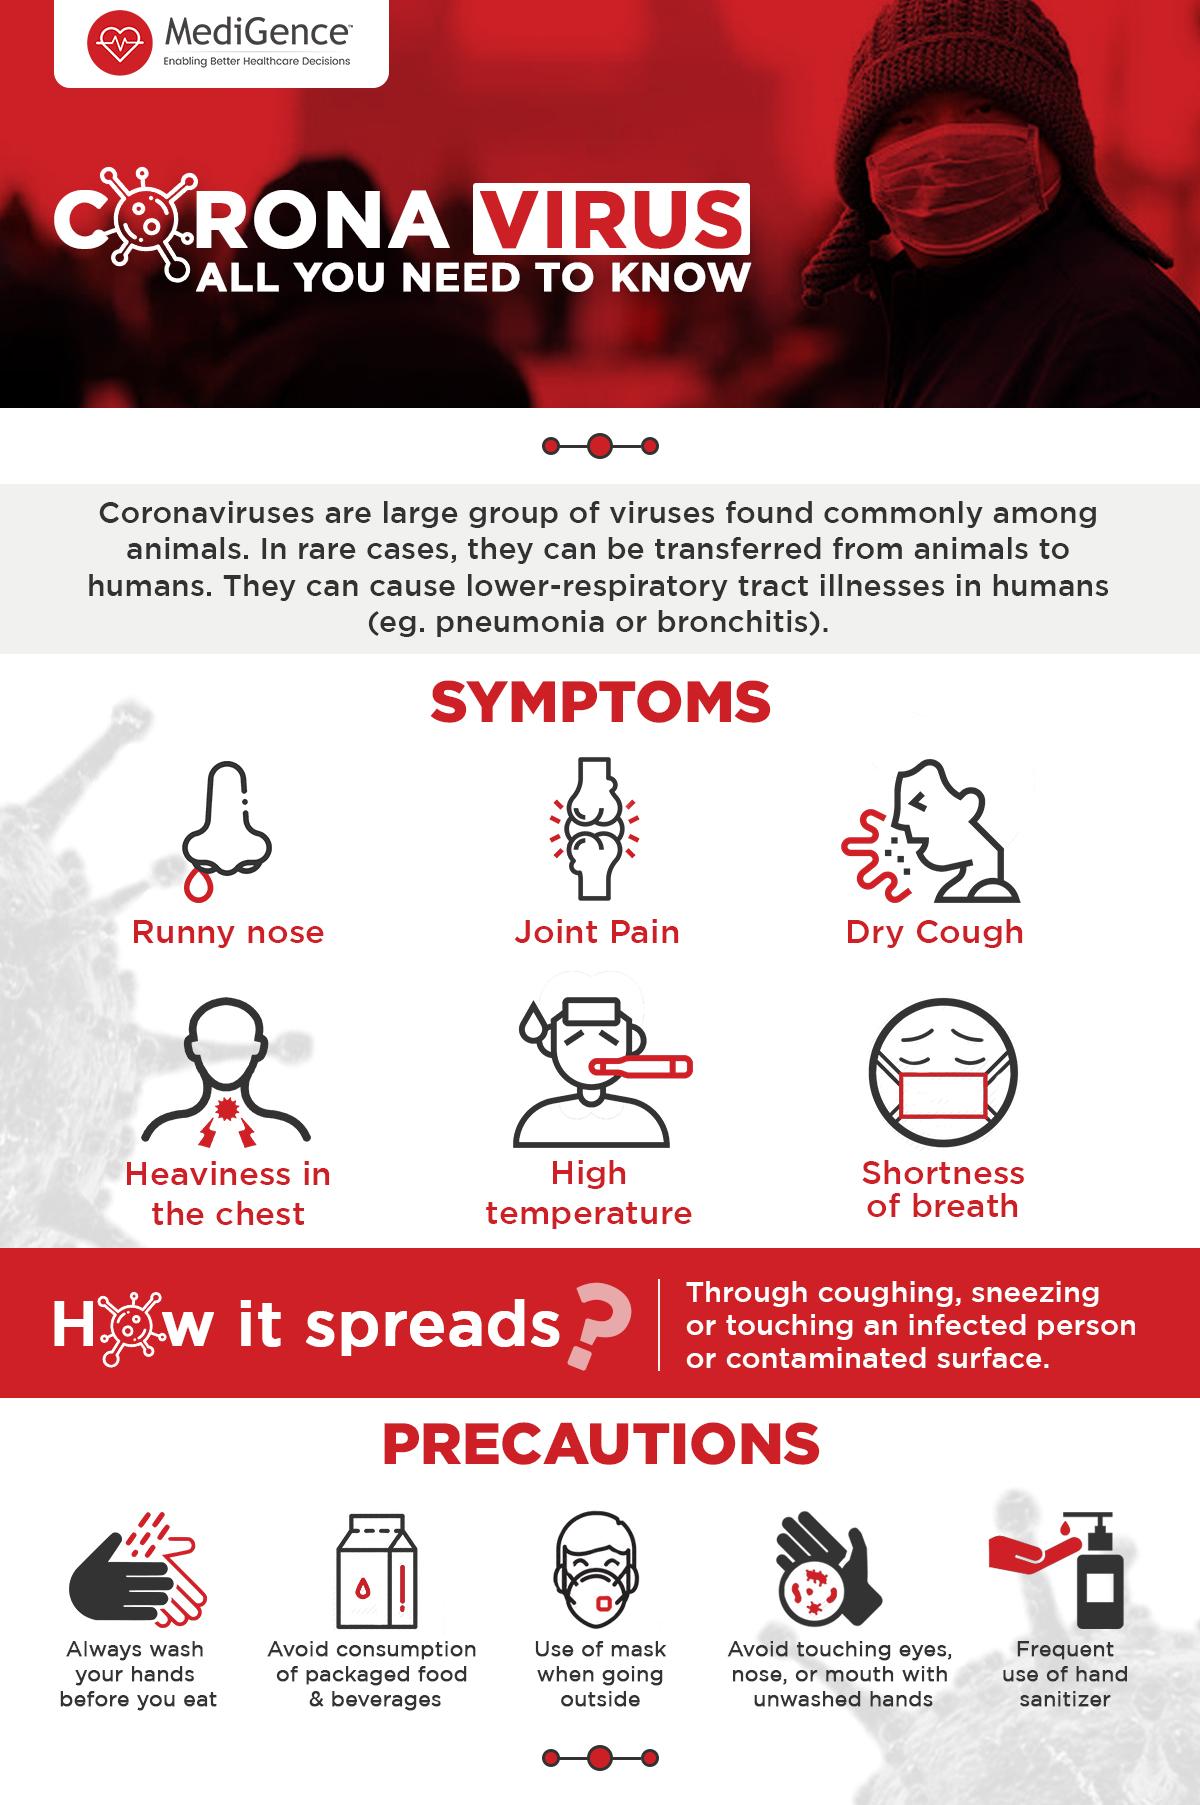 Corona Virus -Symptoms and Precautions